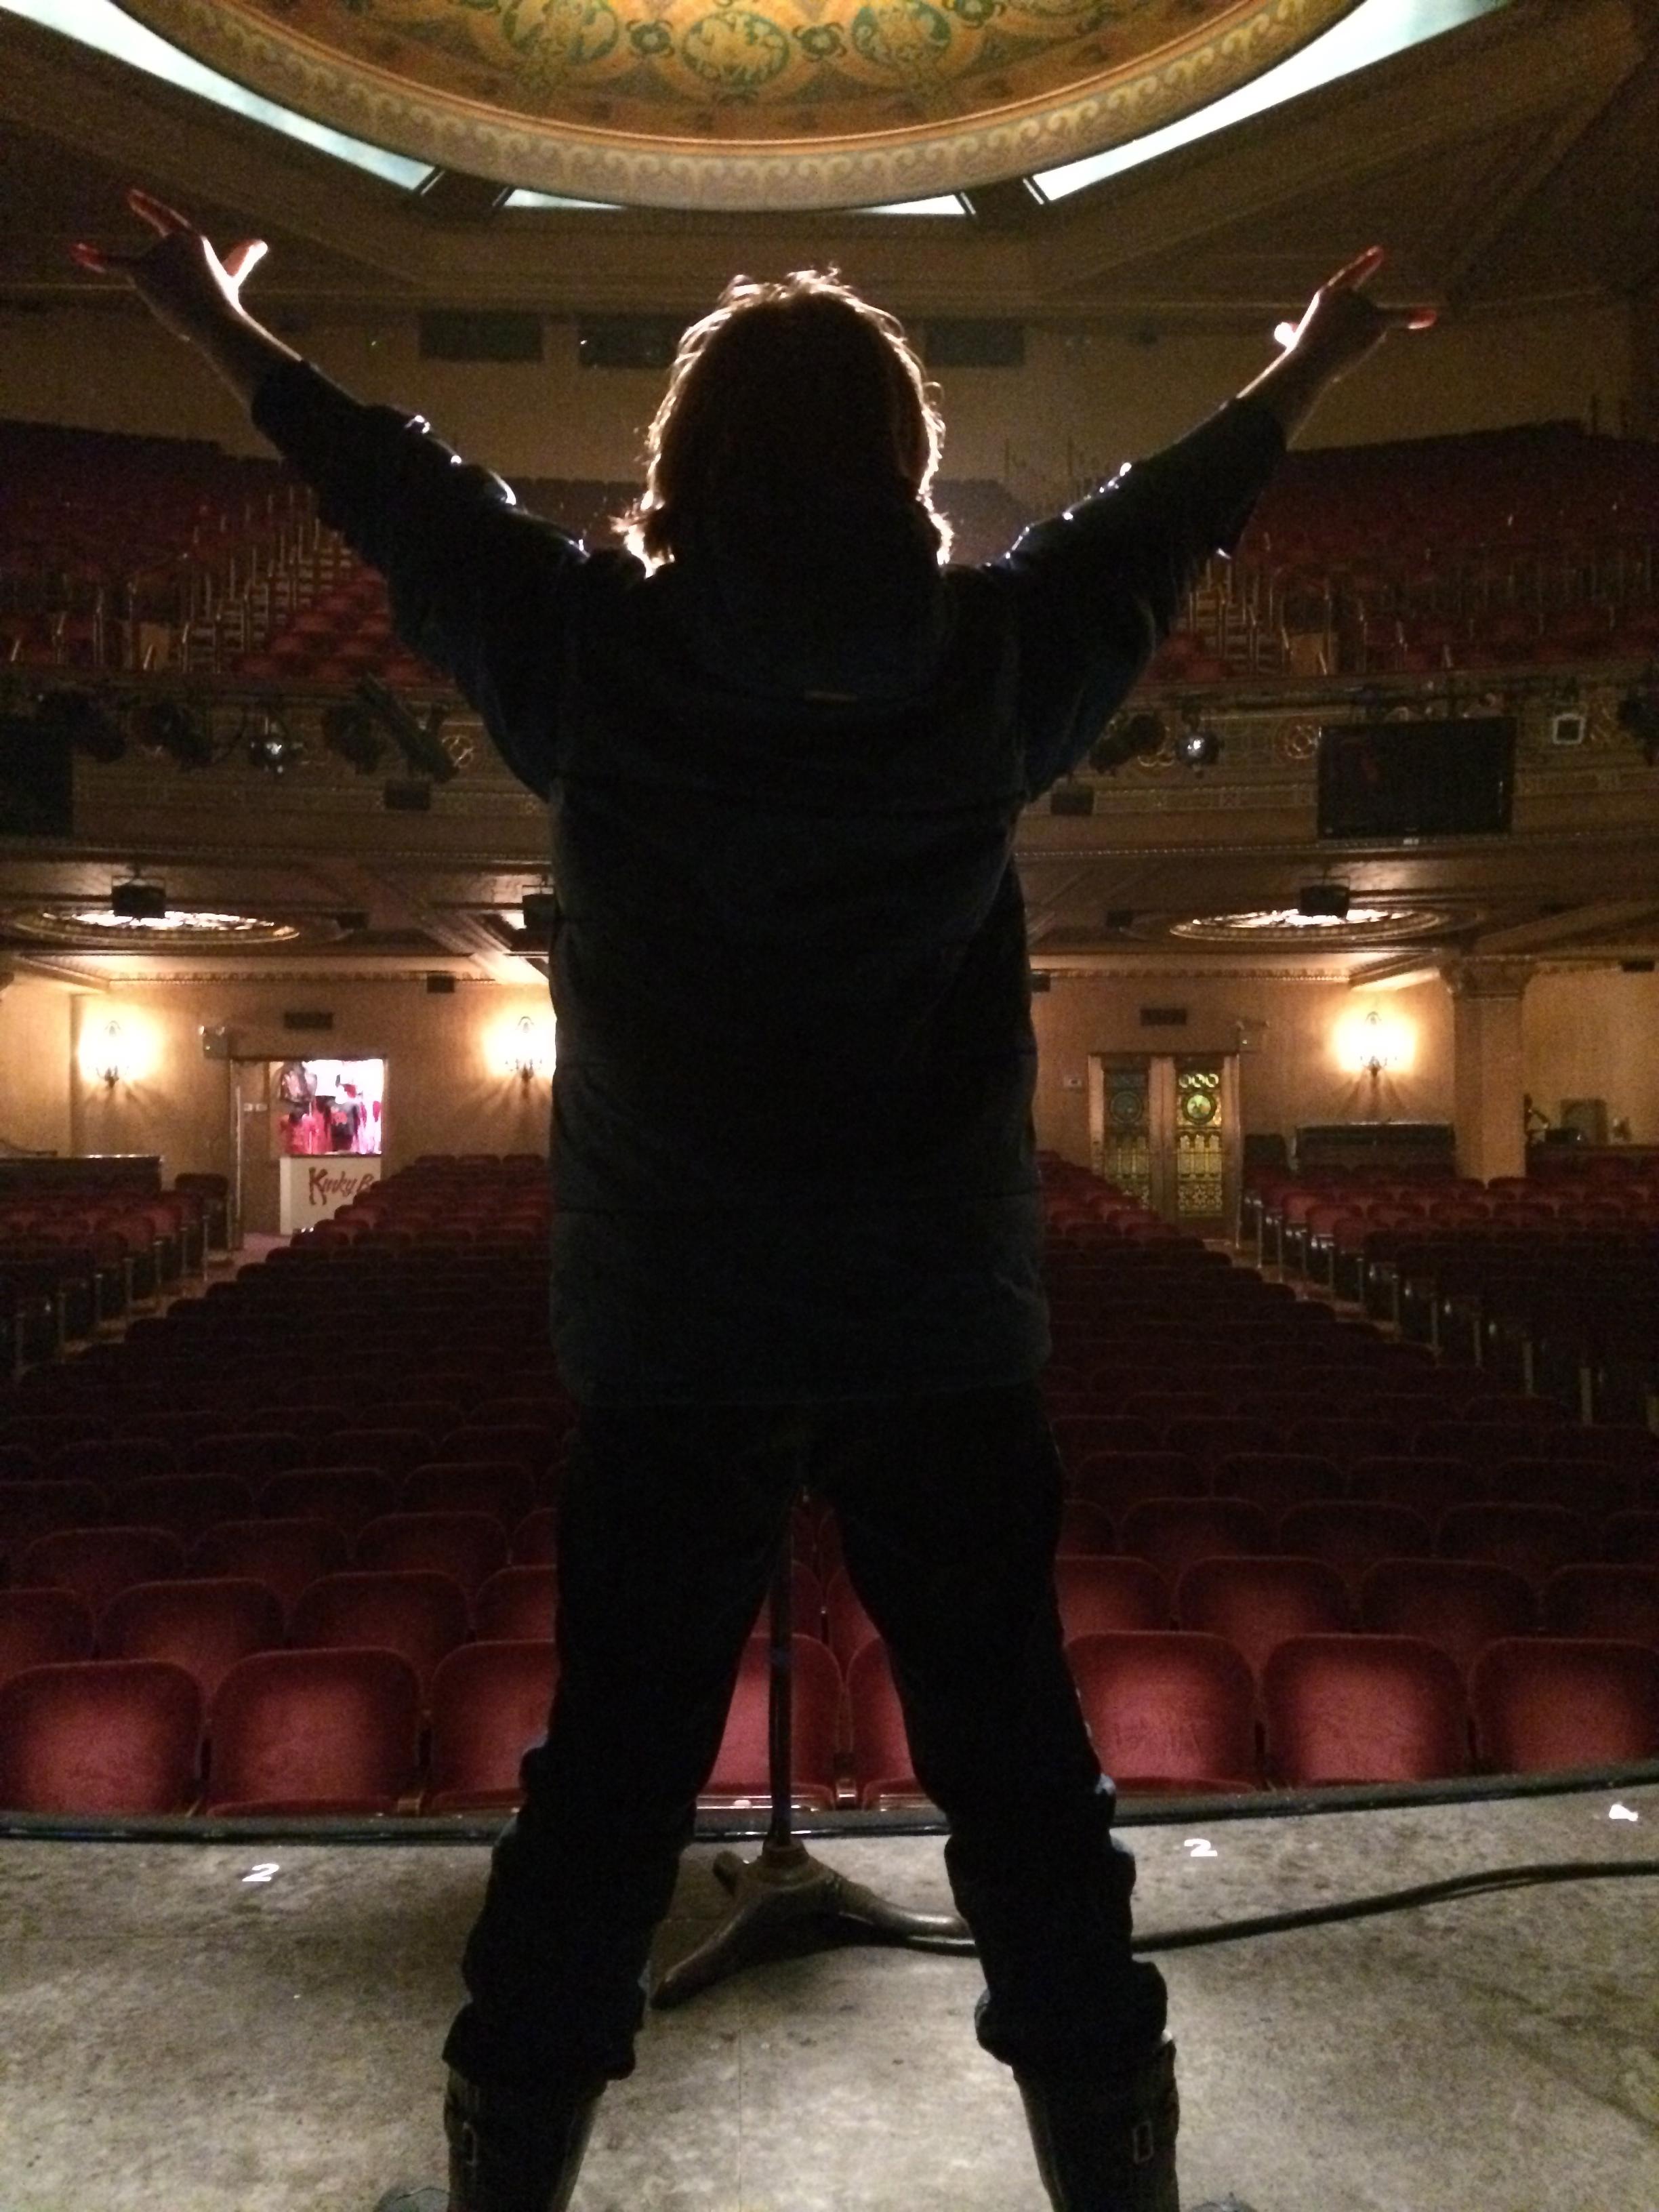 Broadway's Al Hirschfeld Theatre